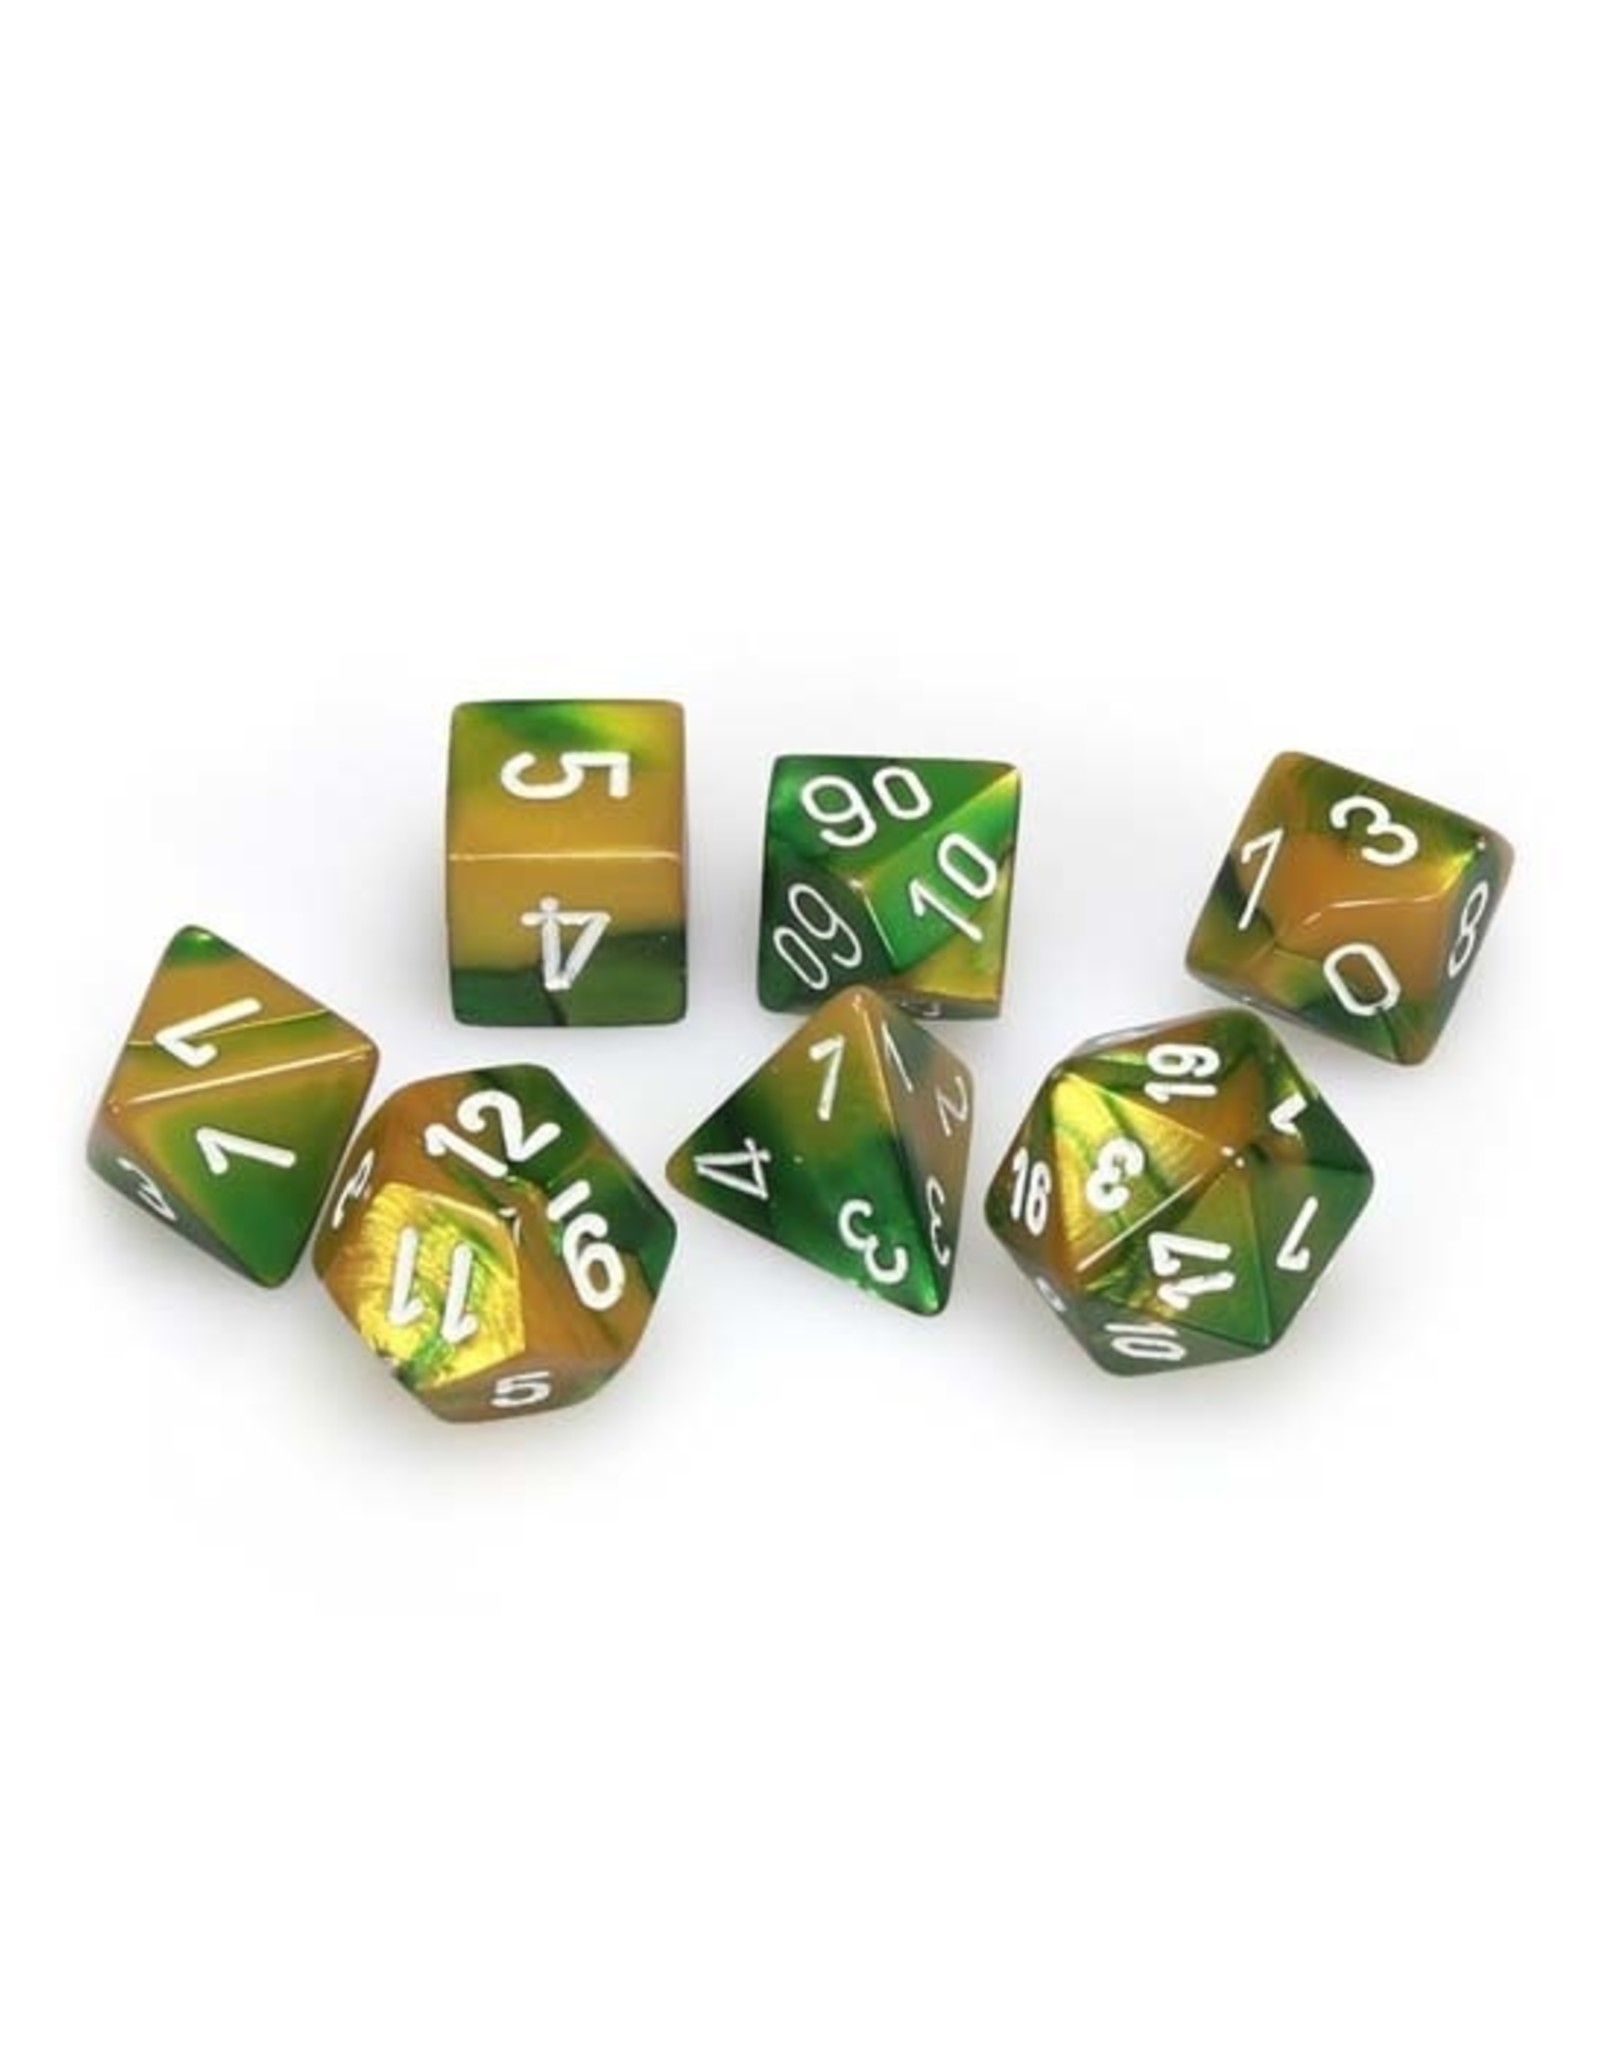 Chessex Chessex: Poly 7 Set - Gemini - Gold-Green w/ White